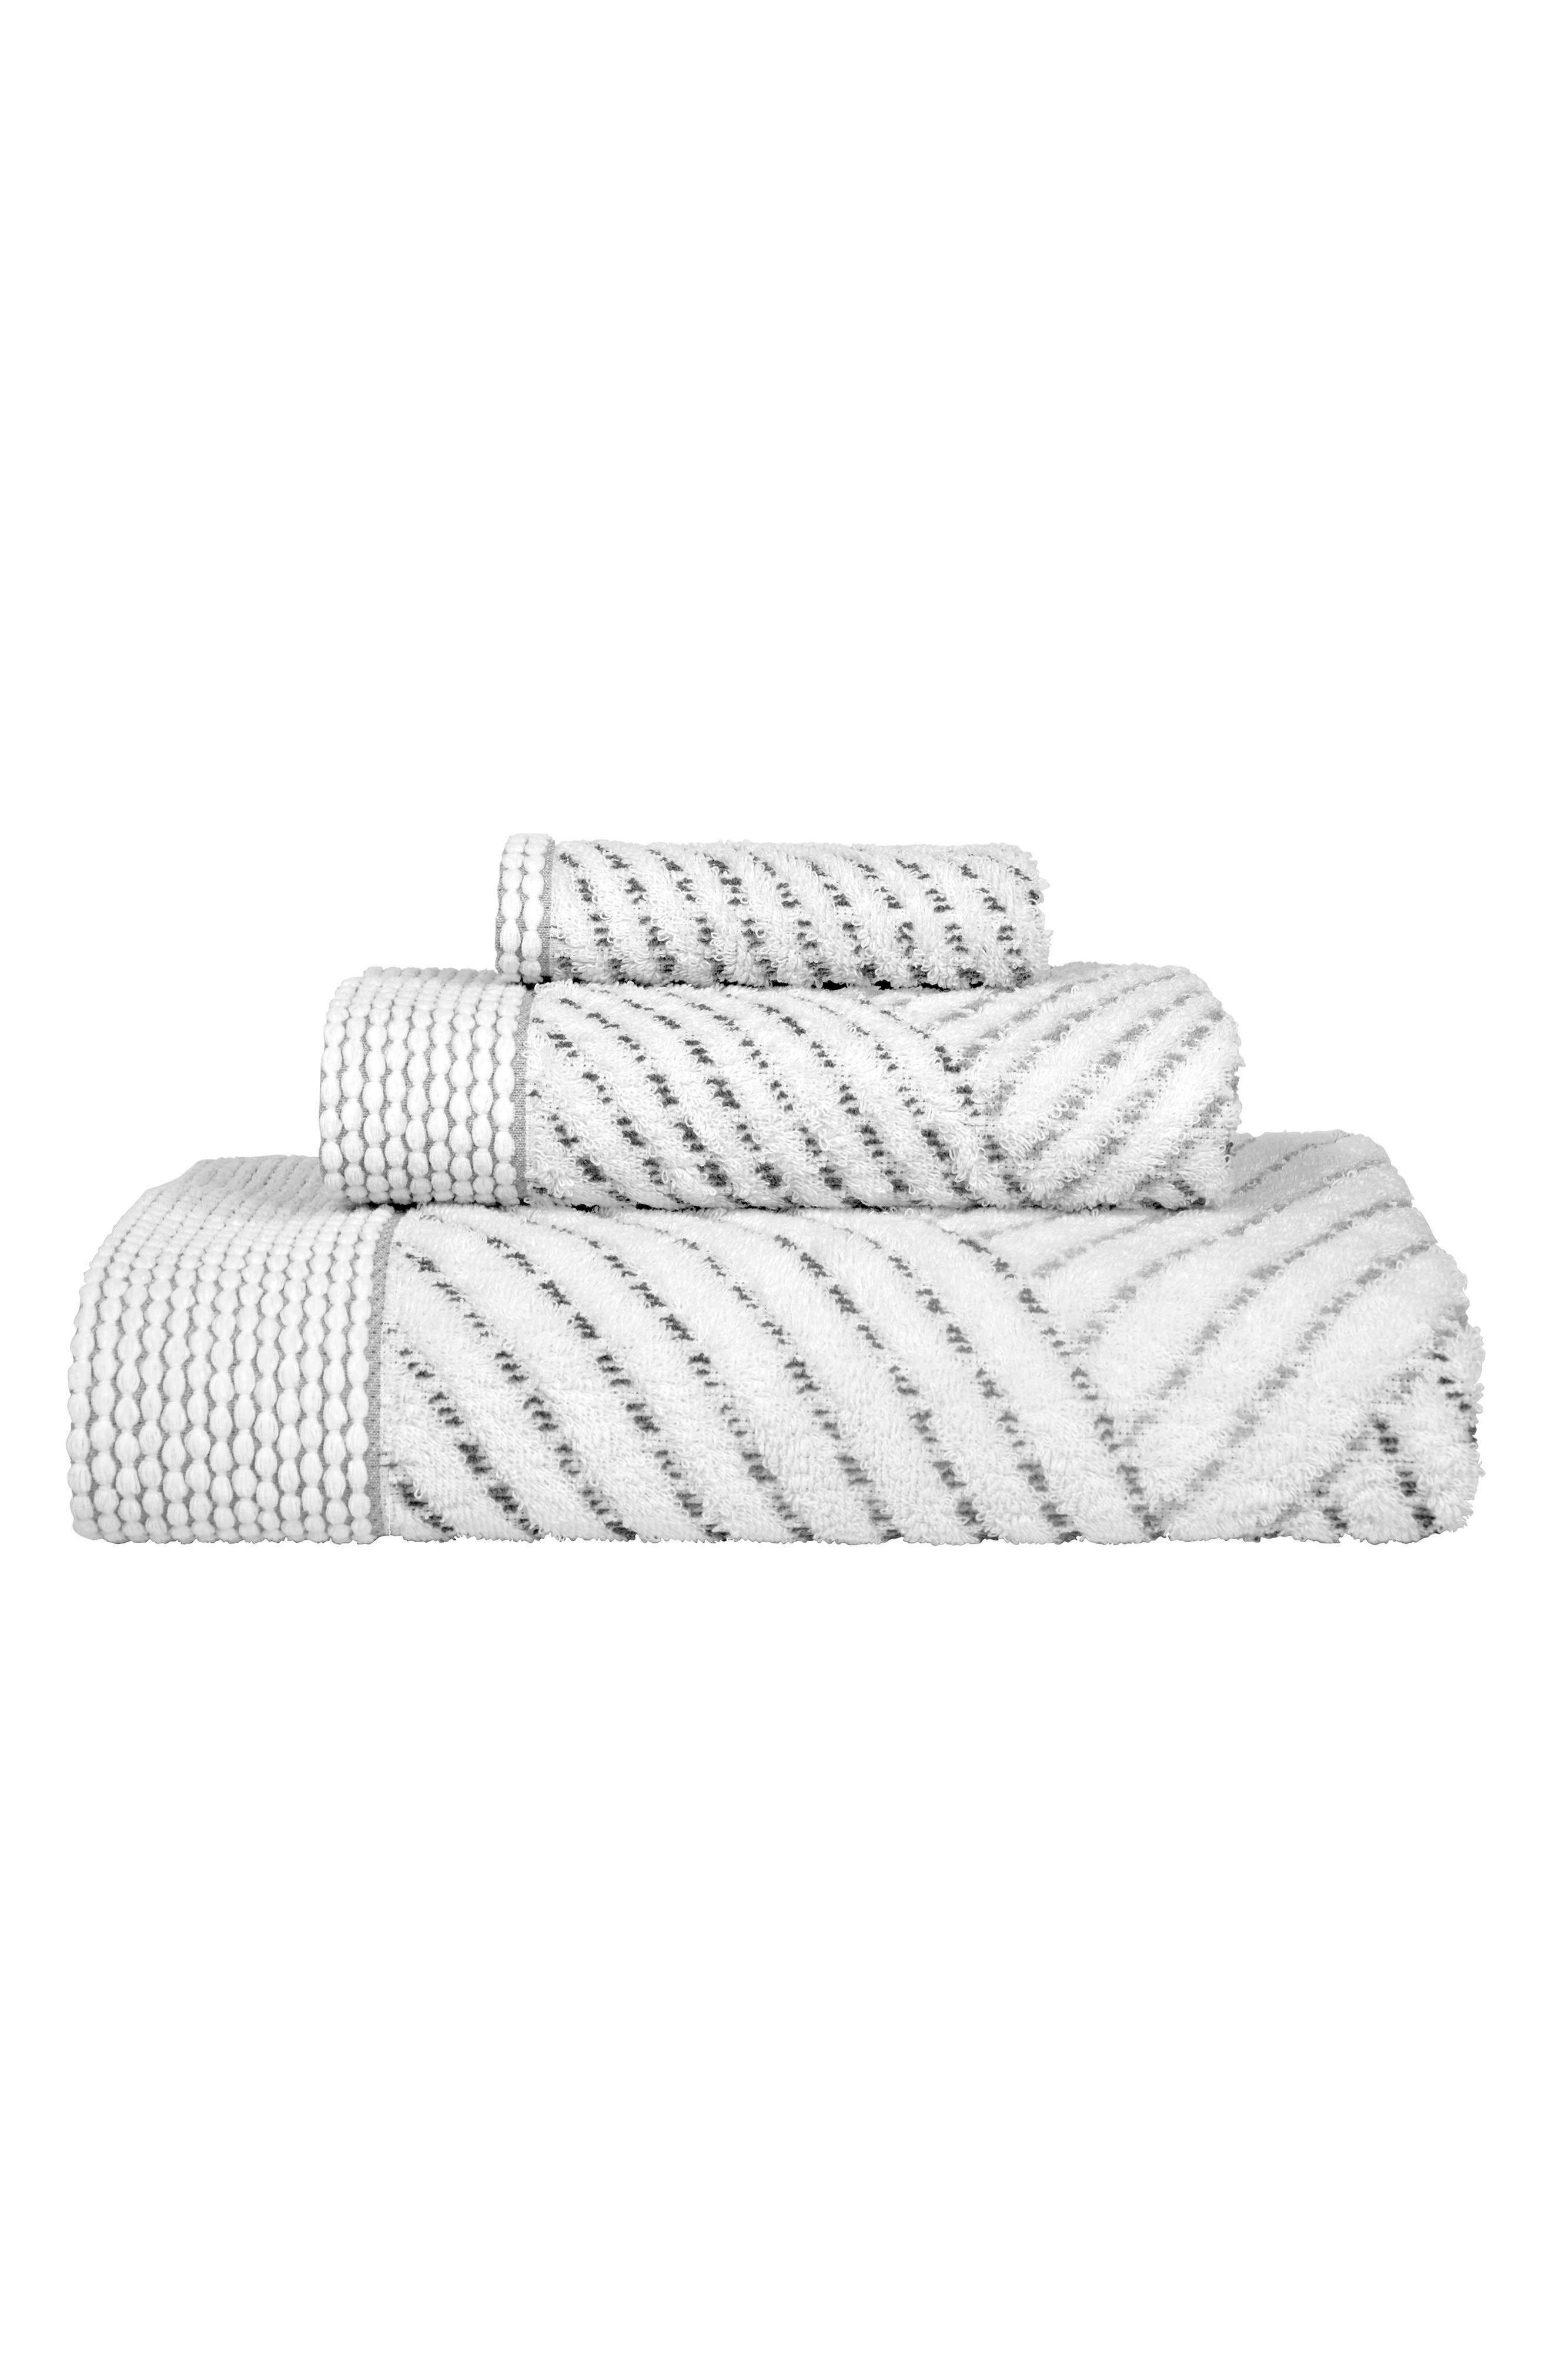 Sazid Bath Towel,                             Alternate thumbnail 2, color,                             Grey